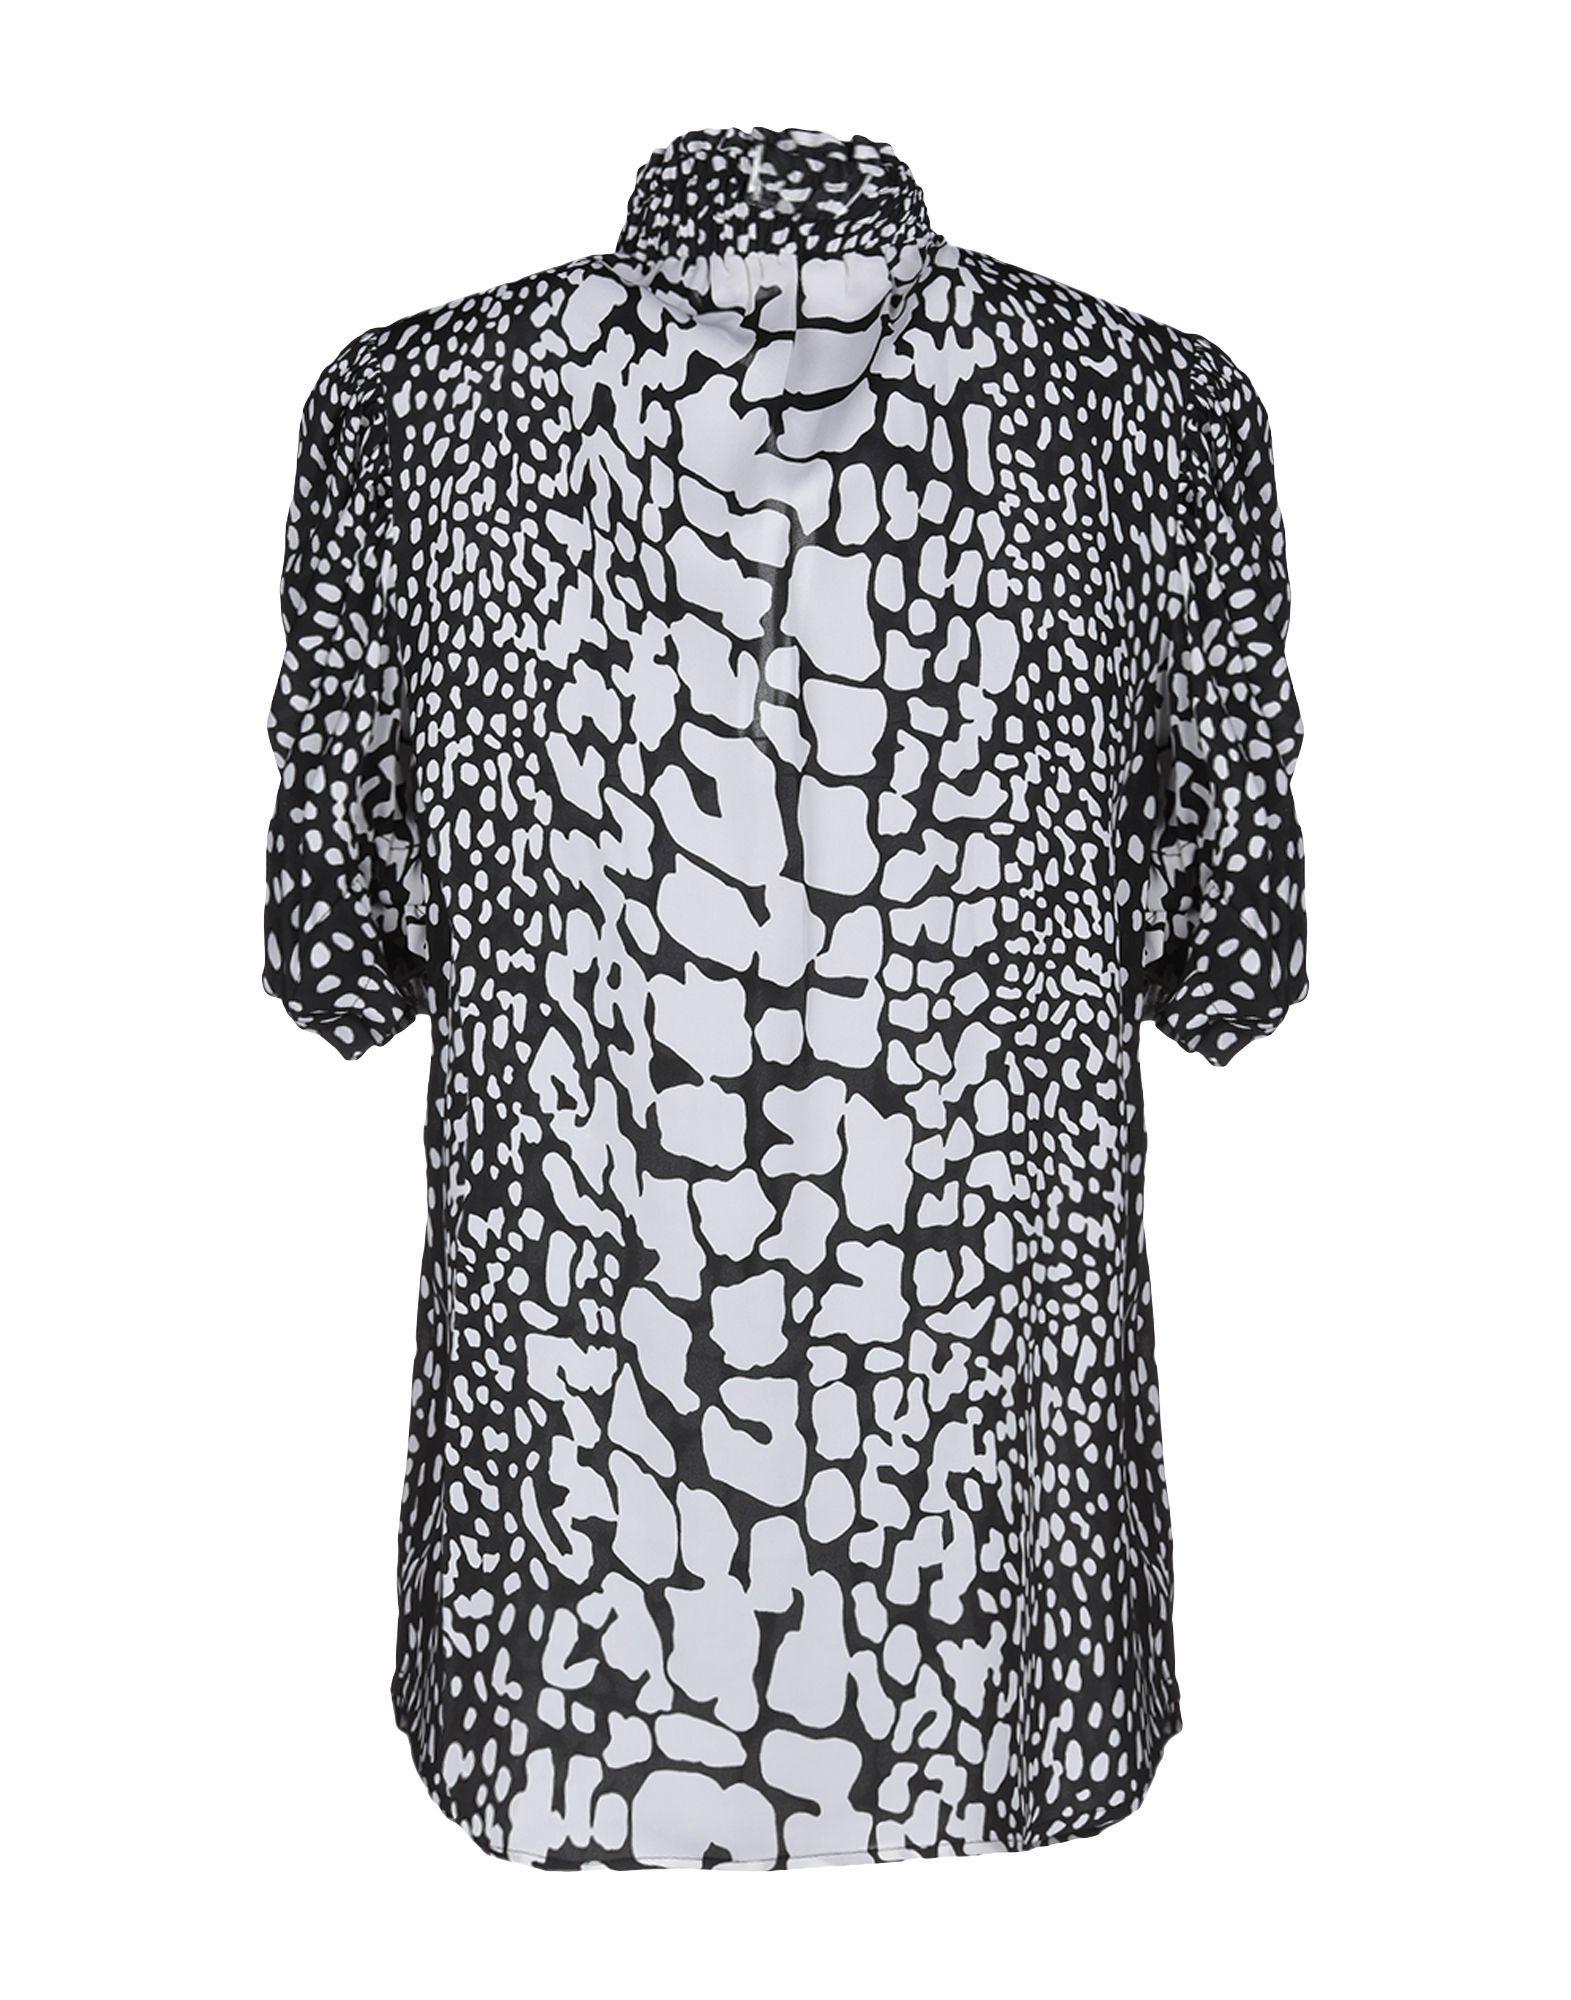 SHIRTS Michael Michael Kors Black Woman Silk